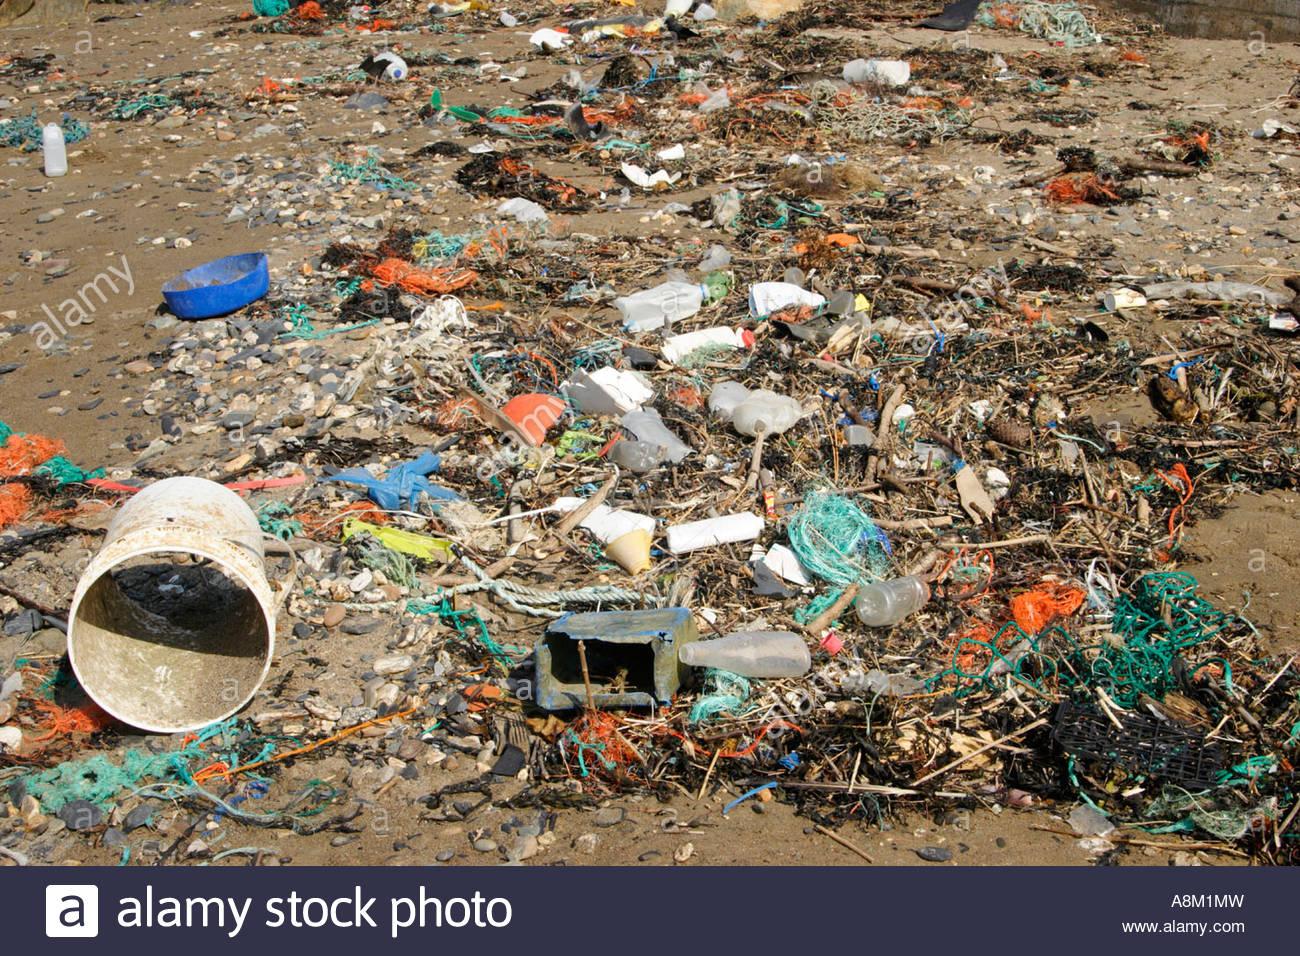 A rubbish-strewn beach, Port Isaac, Cornwall. - Stock Image